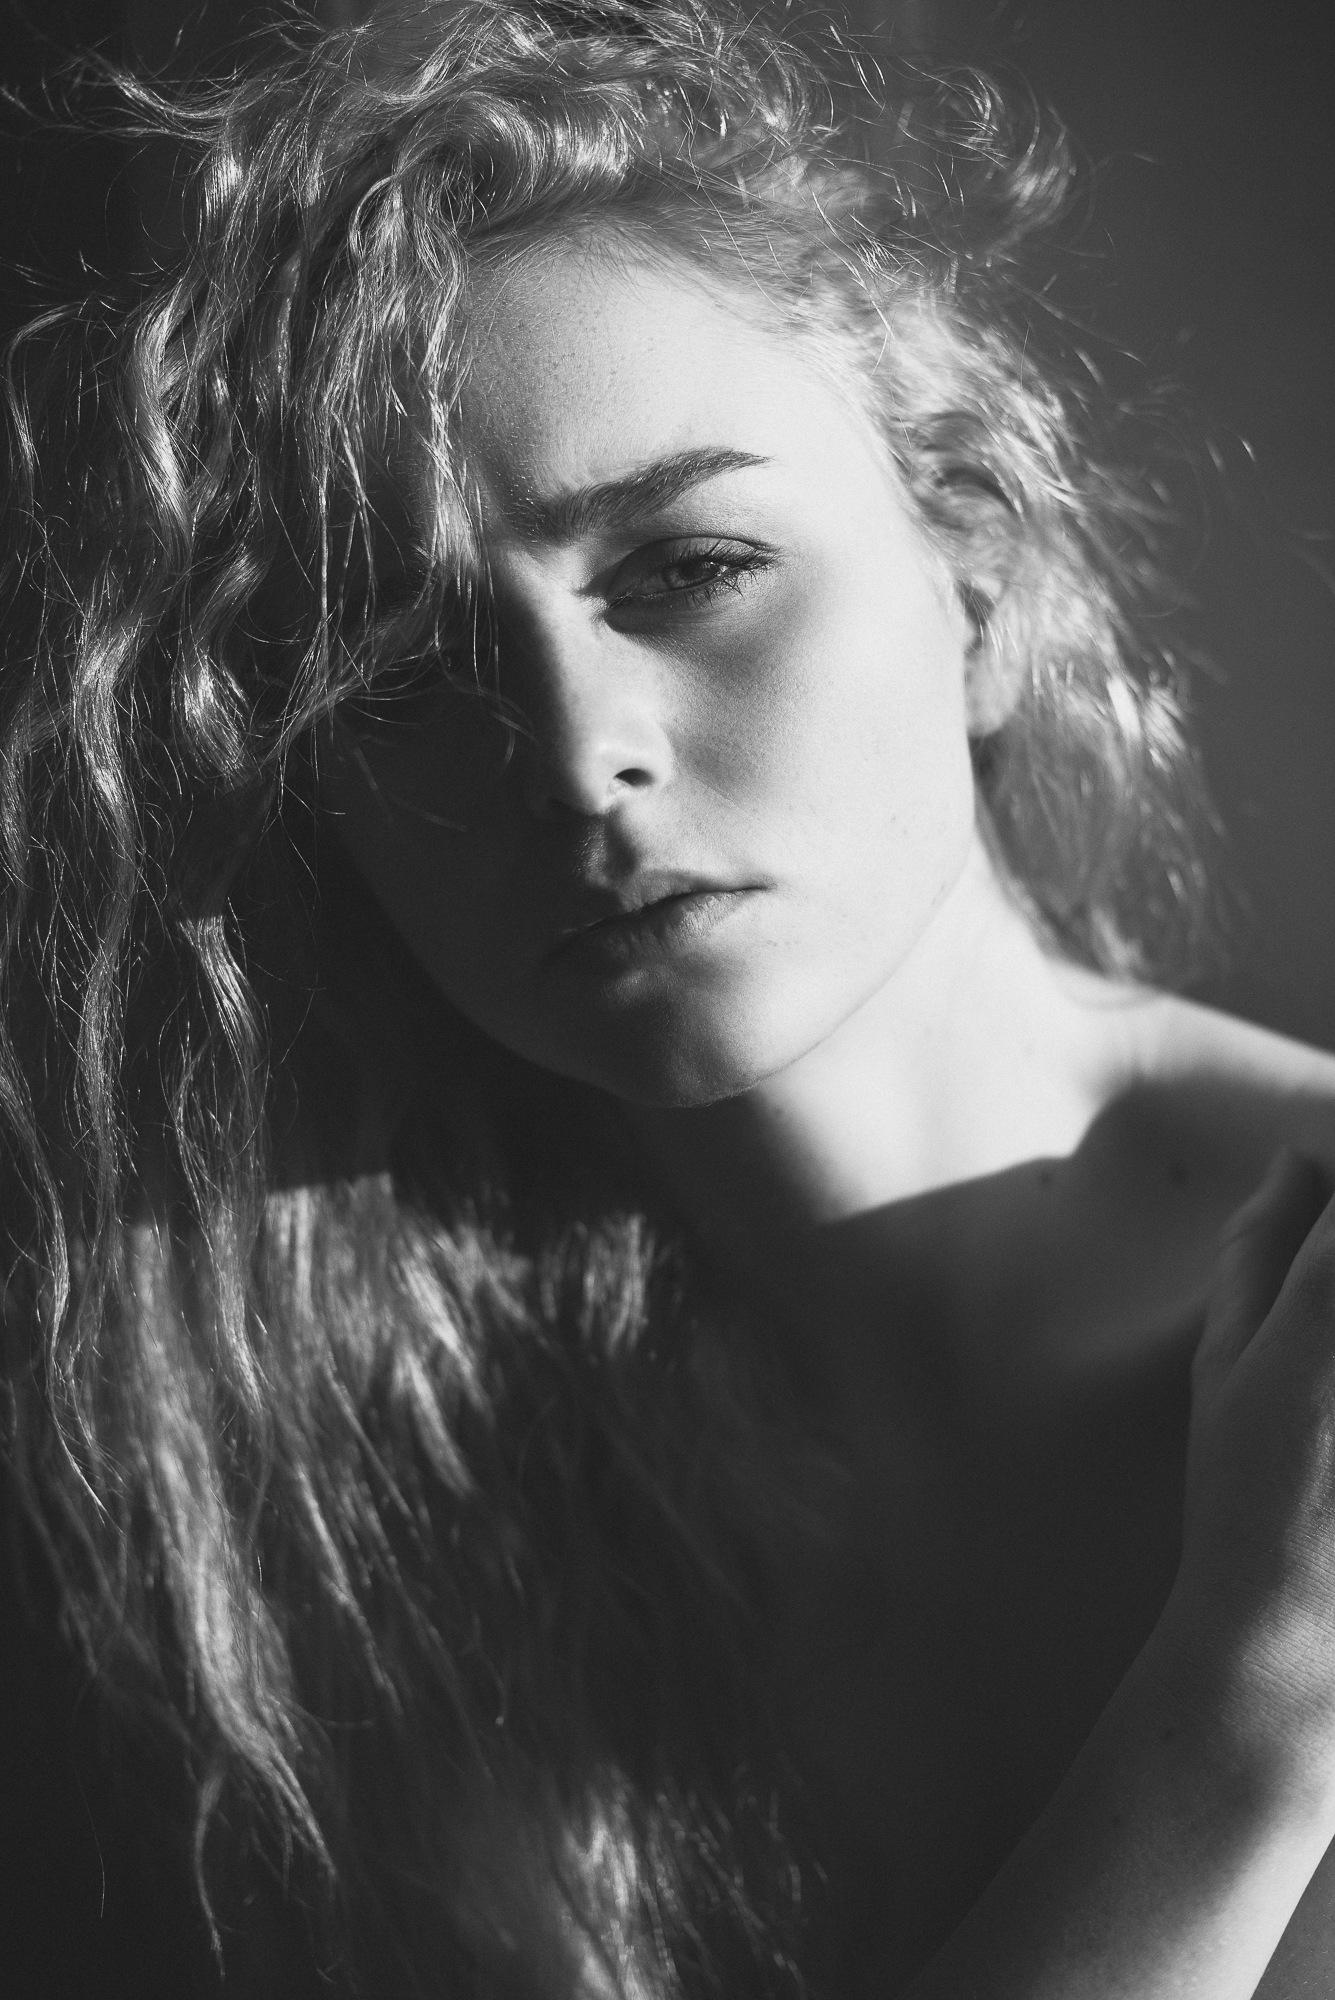 Vera by Thomas Ruppel